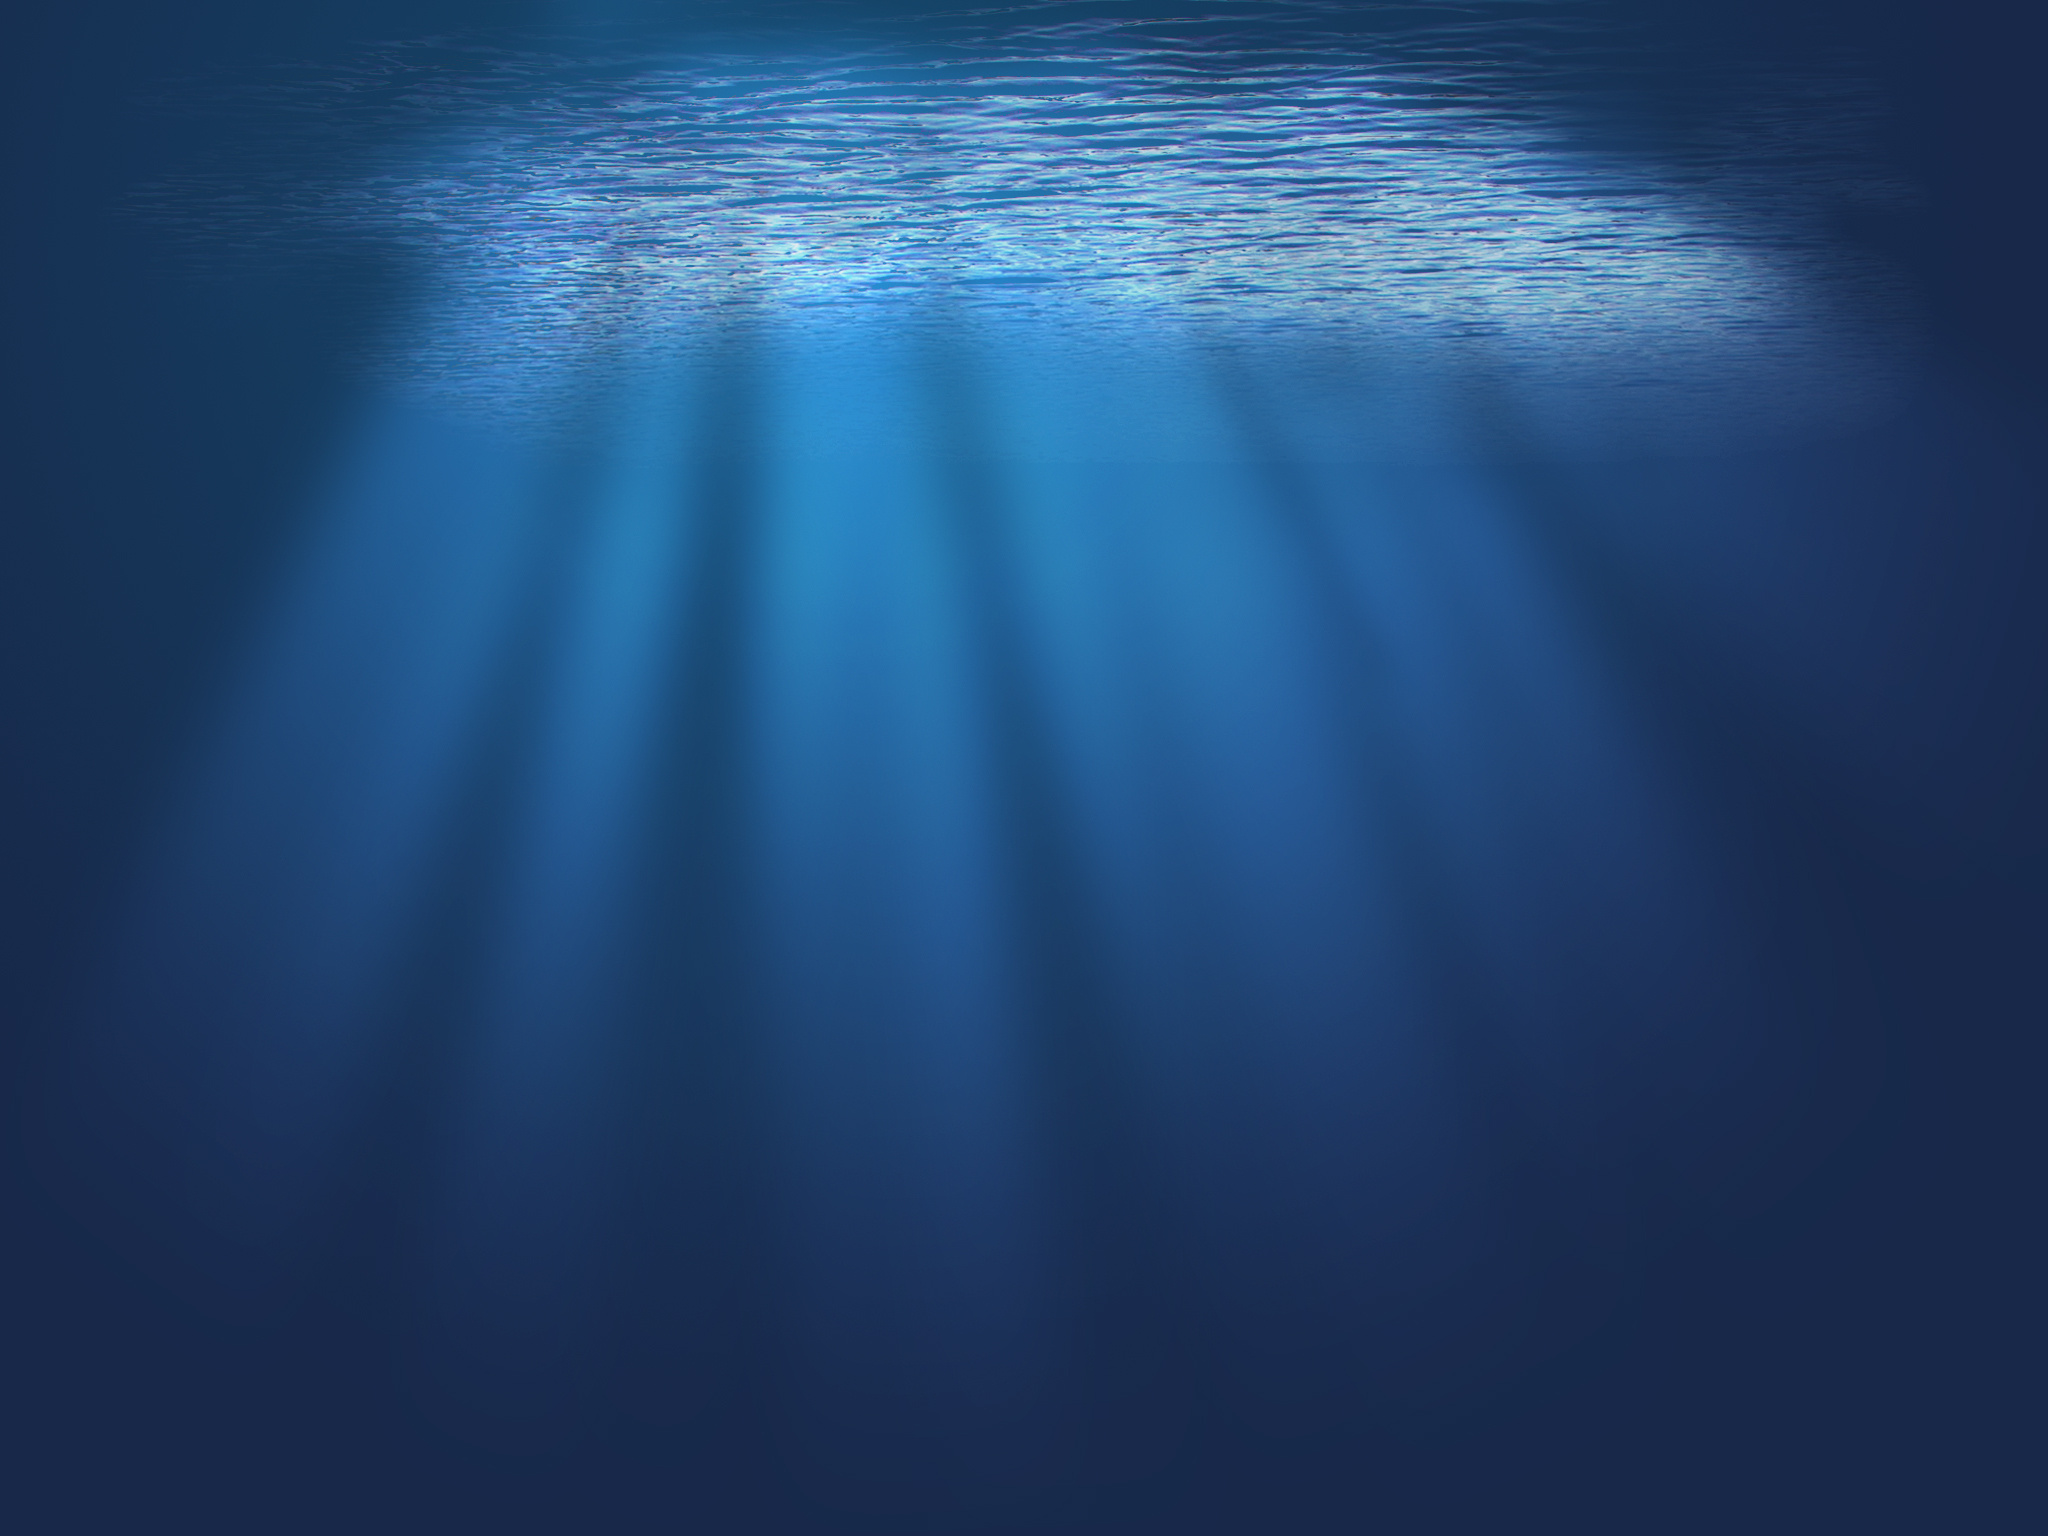 Under Water Wallpaper HD Freetopwallpapercom 2048x1536